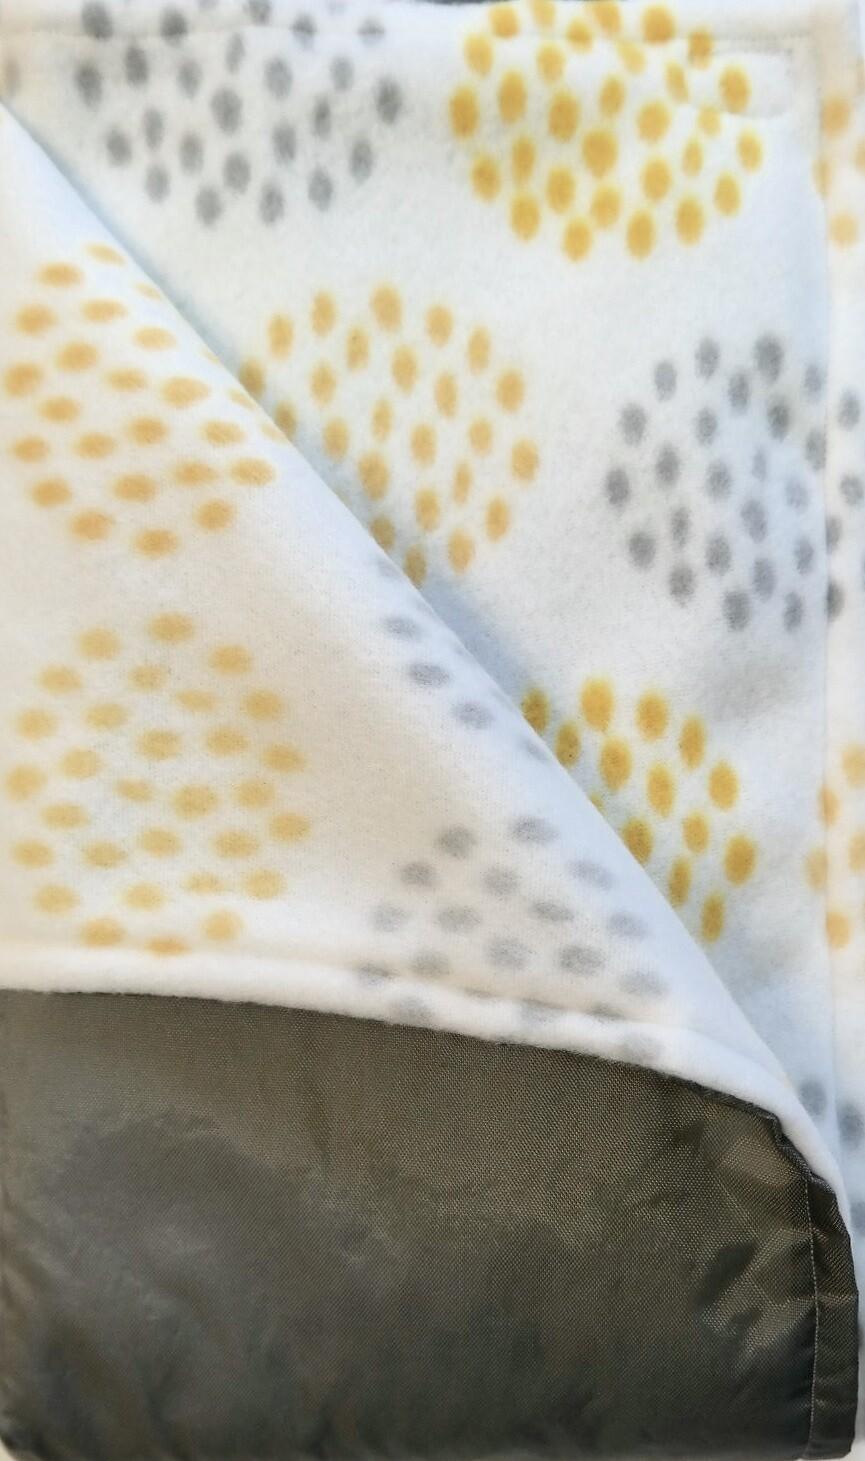 66 C Pitt Patt Blanket yellow & grey dots